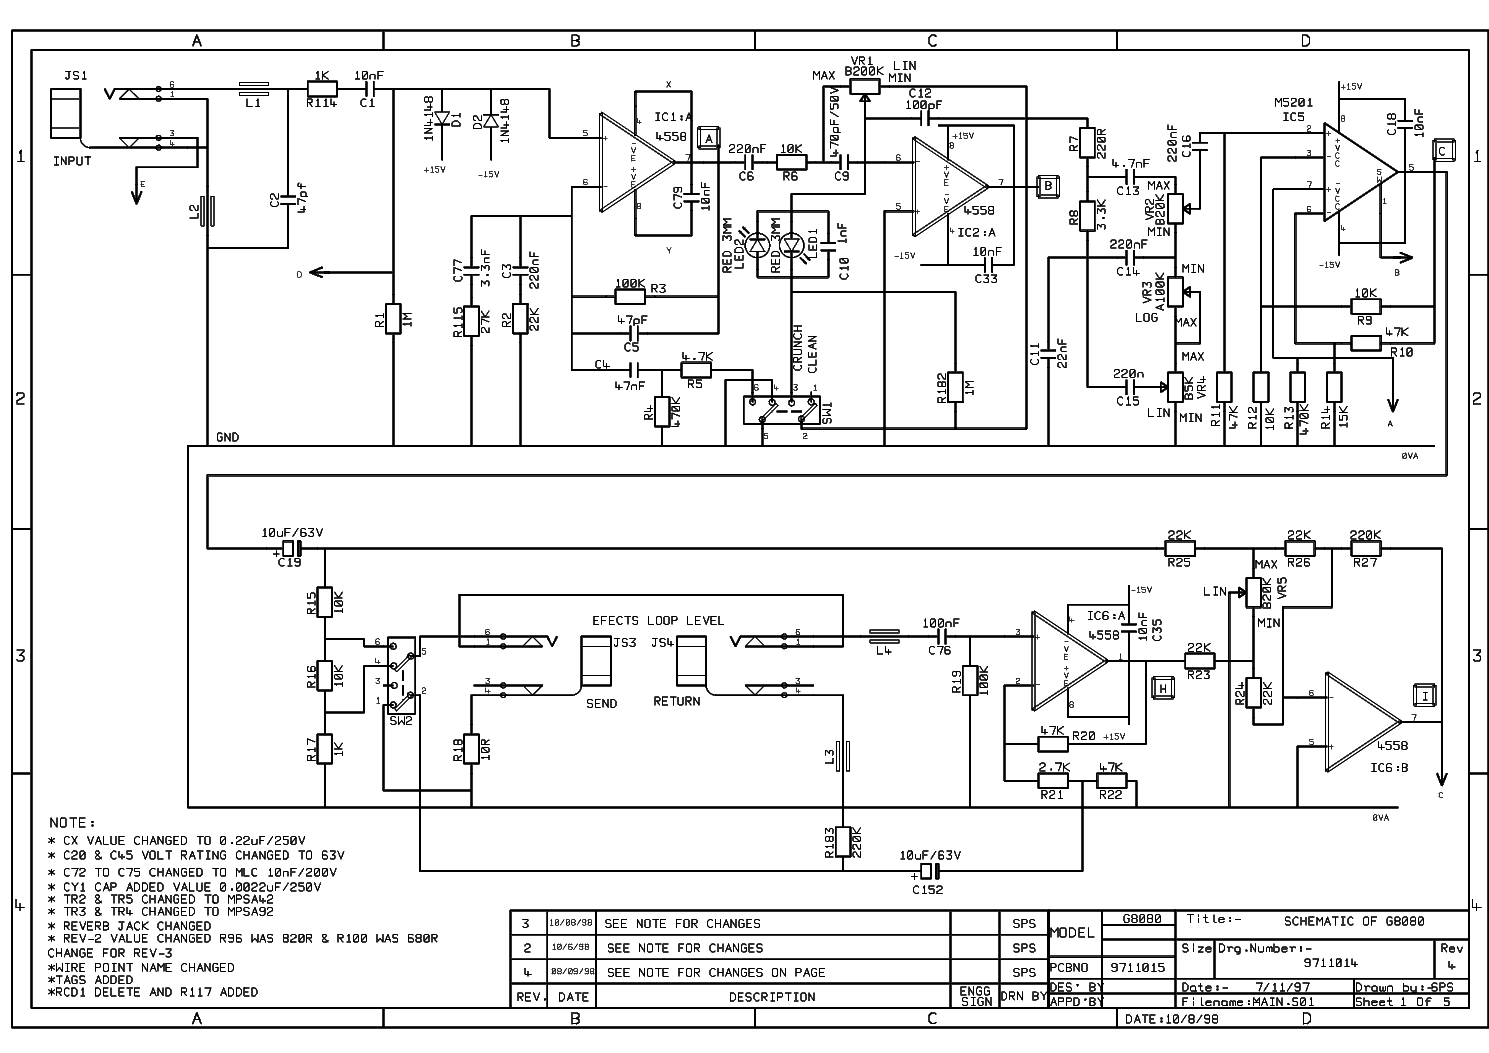 Marshall Vs65r 65w Service Manual Download  Schematics